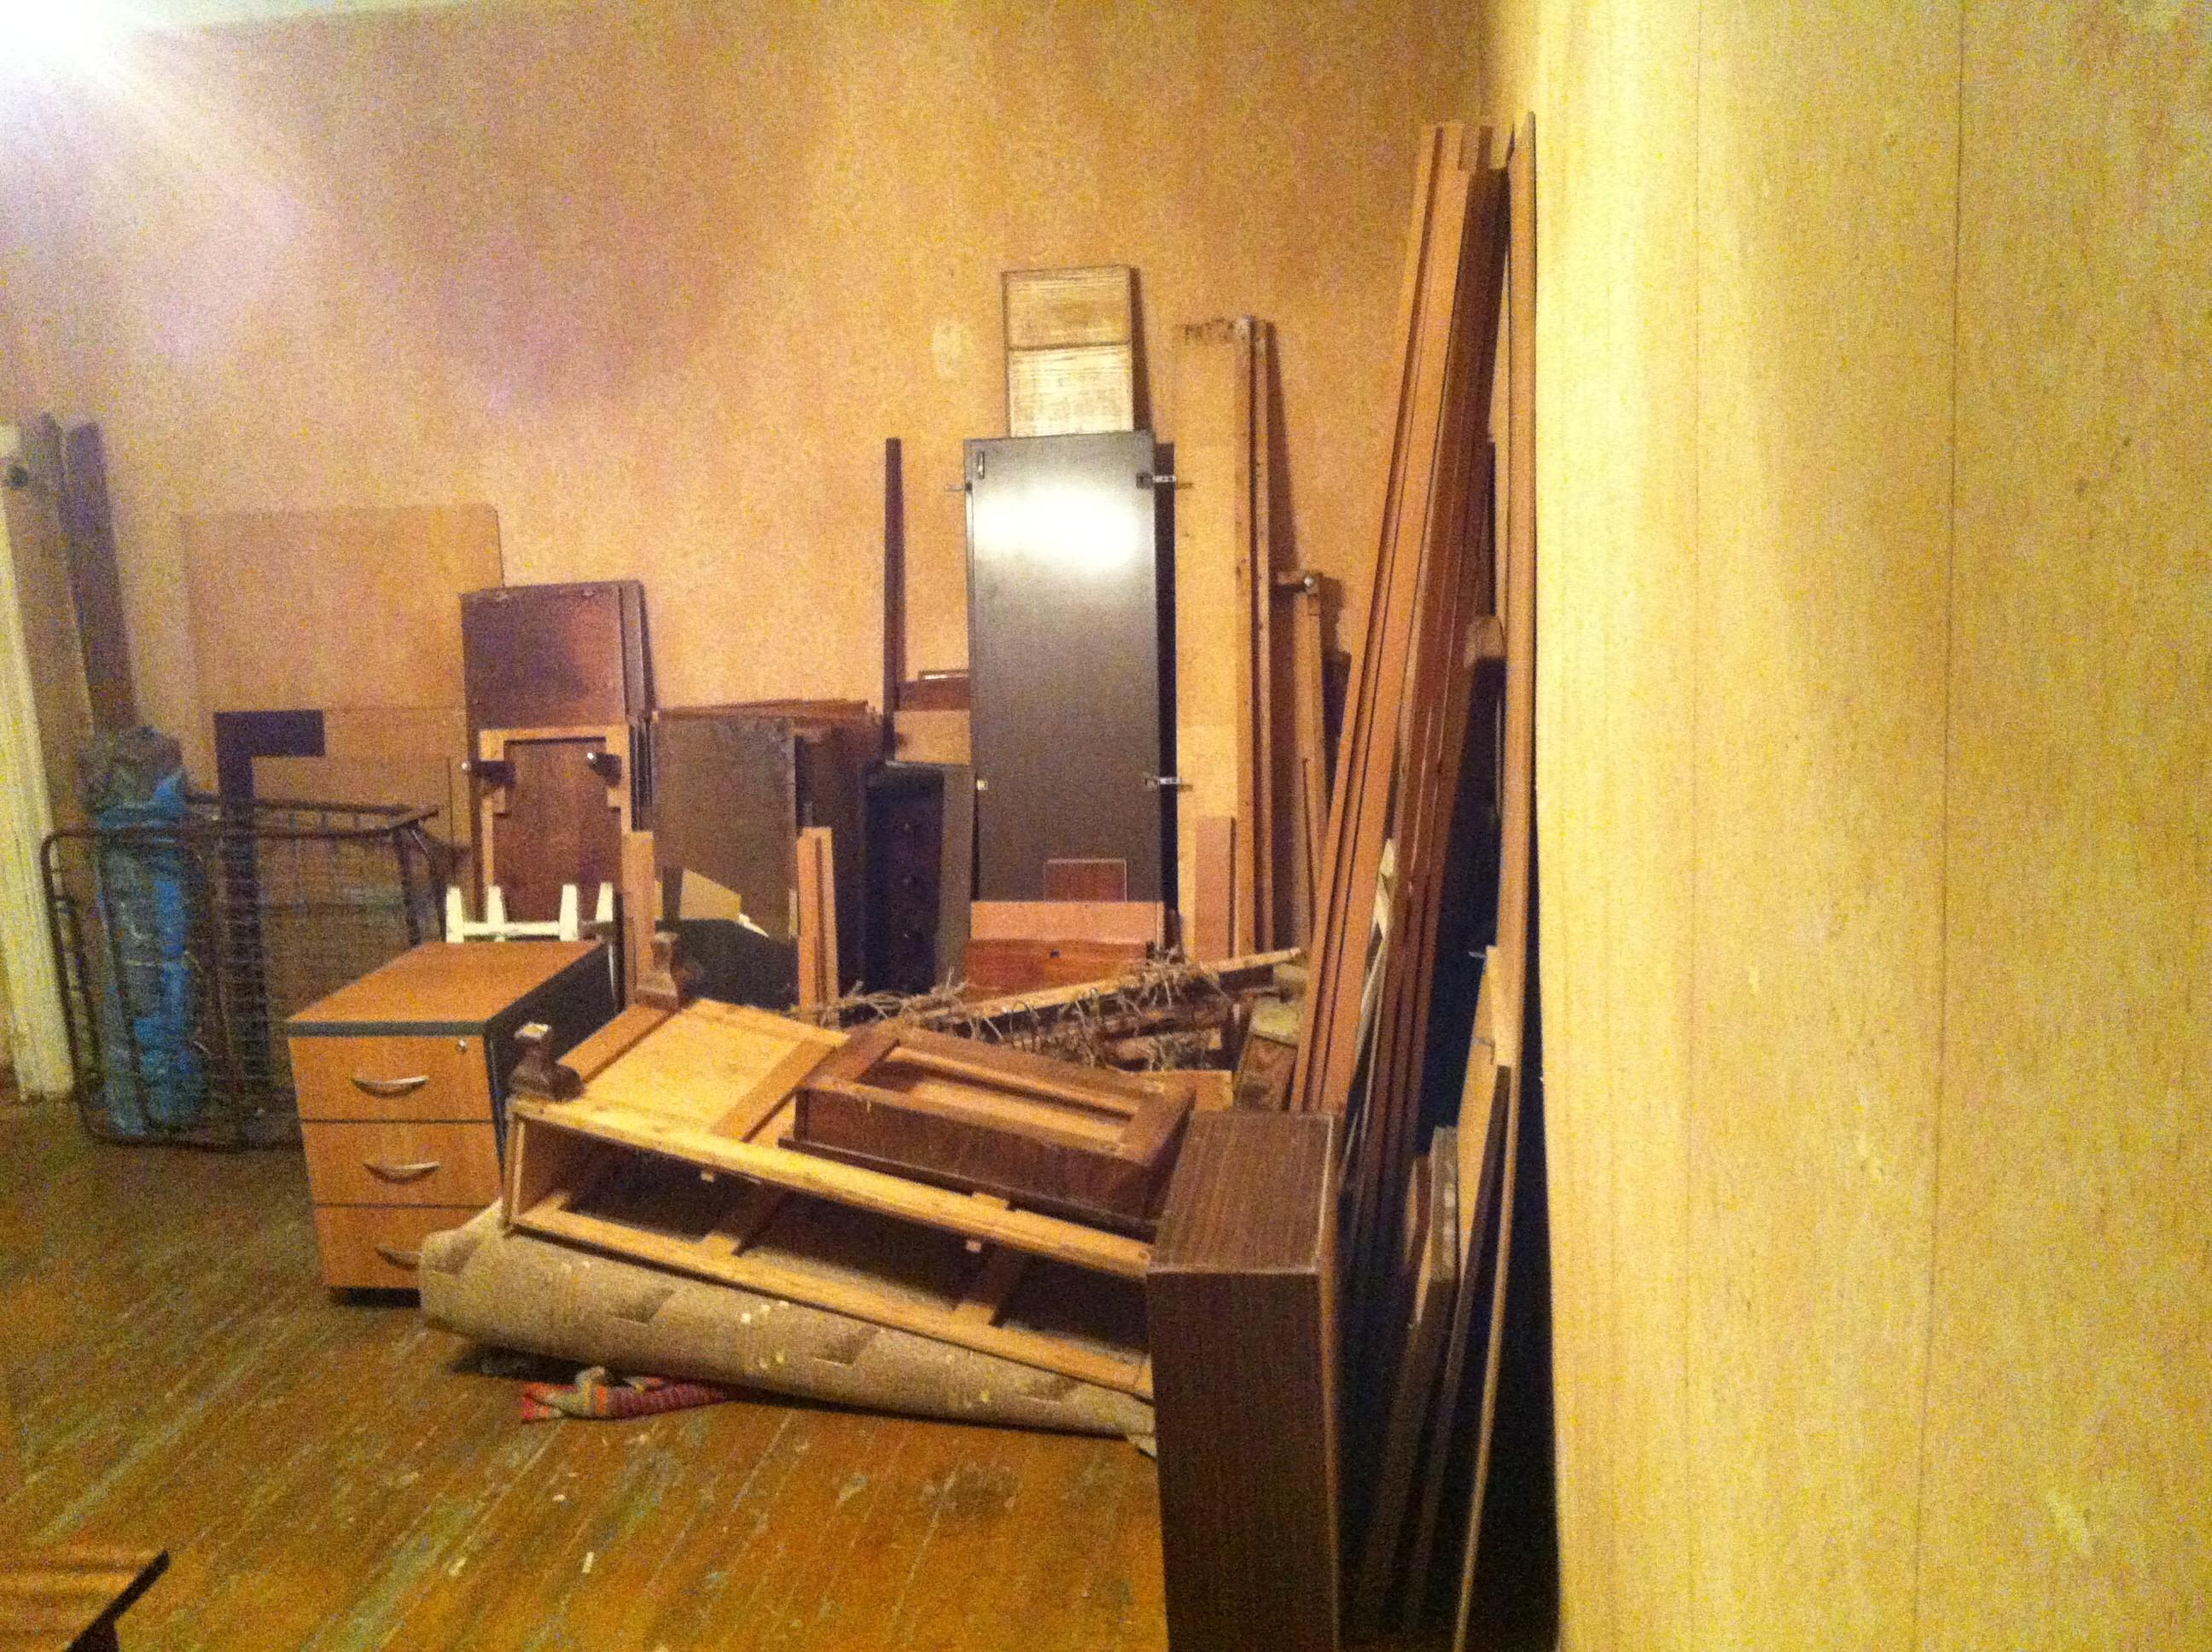 vykinut hlam iz kvartiry v moskve na svalku1 - Выкинуть хлам из квартиры в Москве на свалку